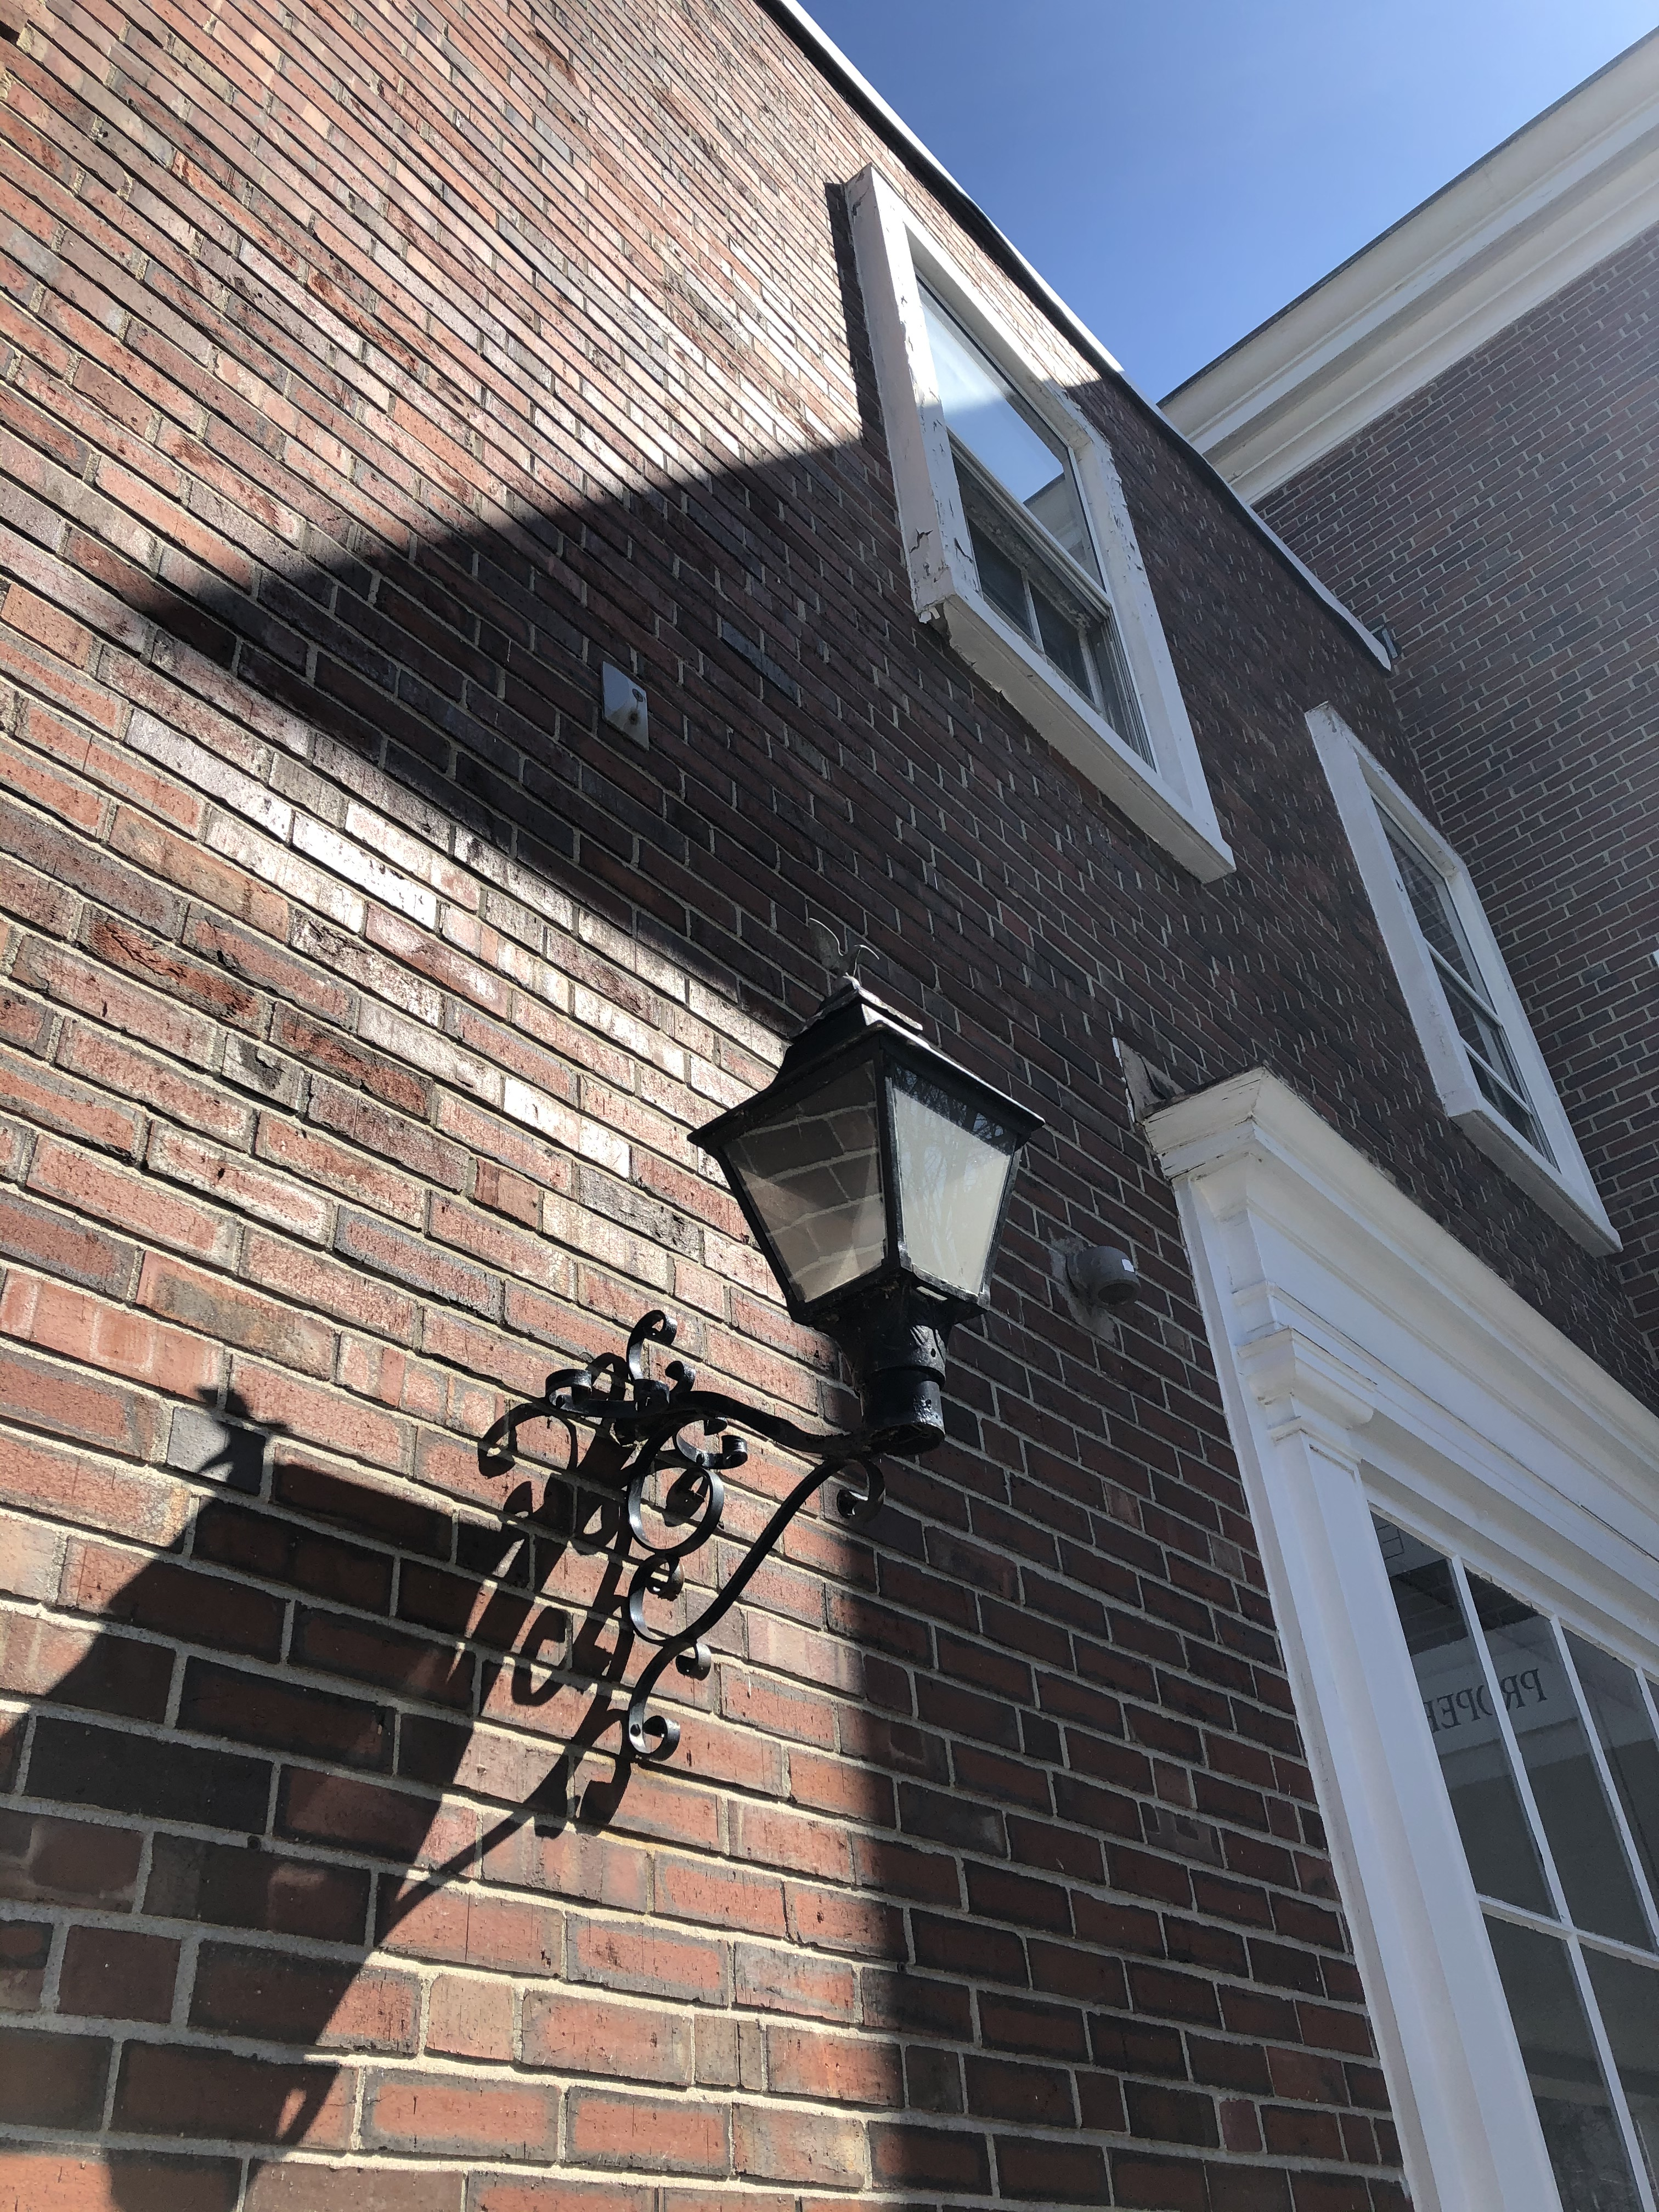 031520-lantern-on-wall